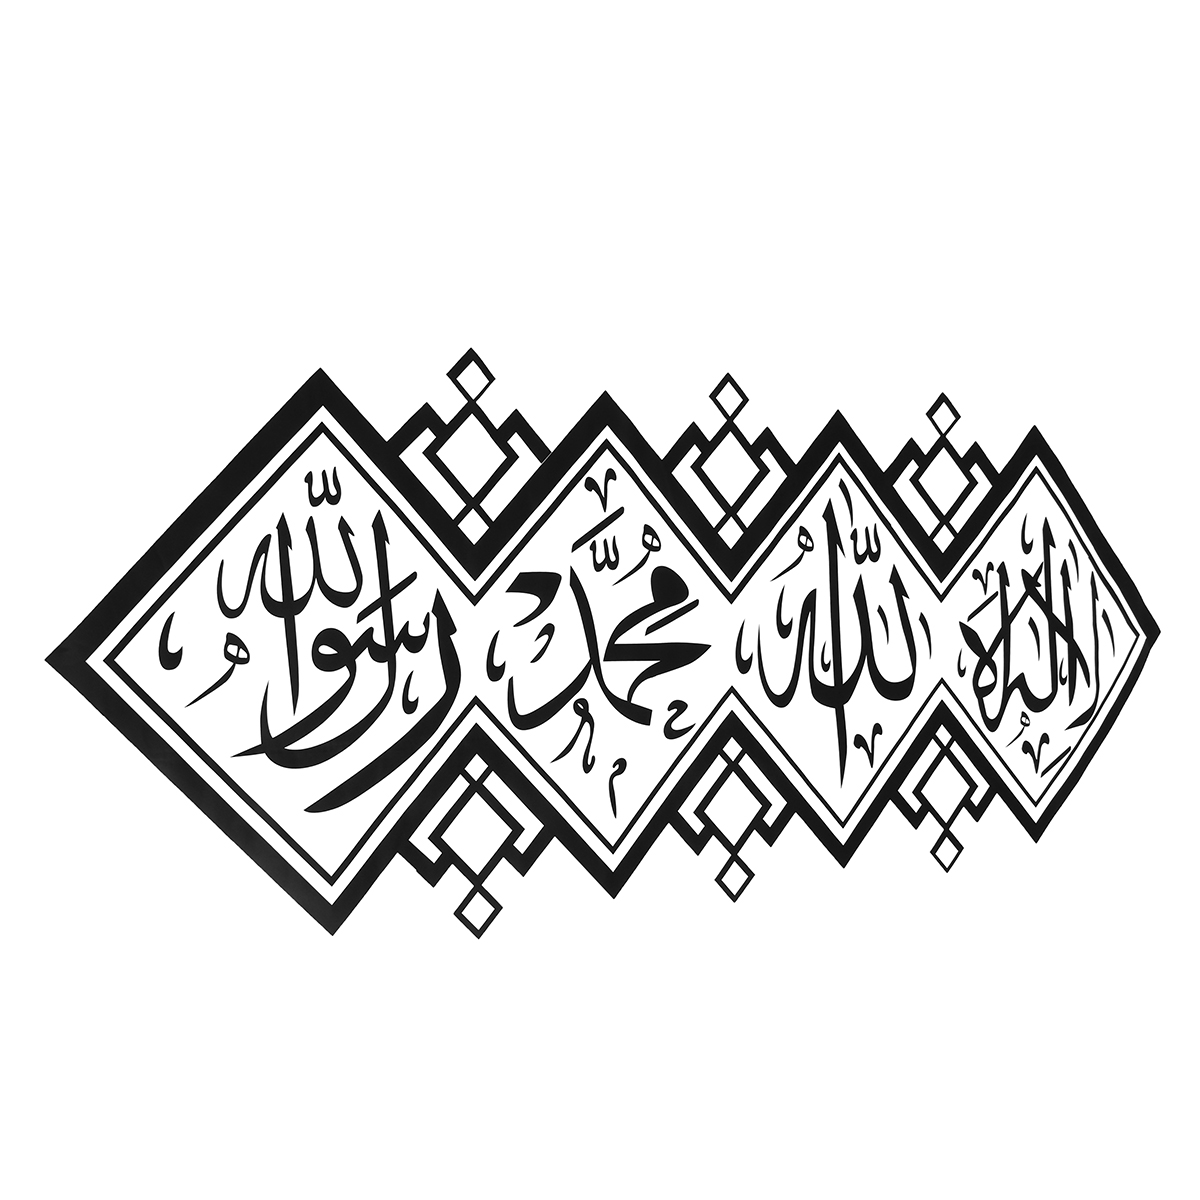 Islamic Muslim Arabic Wall Sticker Mural Art Calligraphy PVC Decal Home Decor